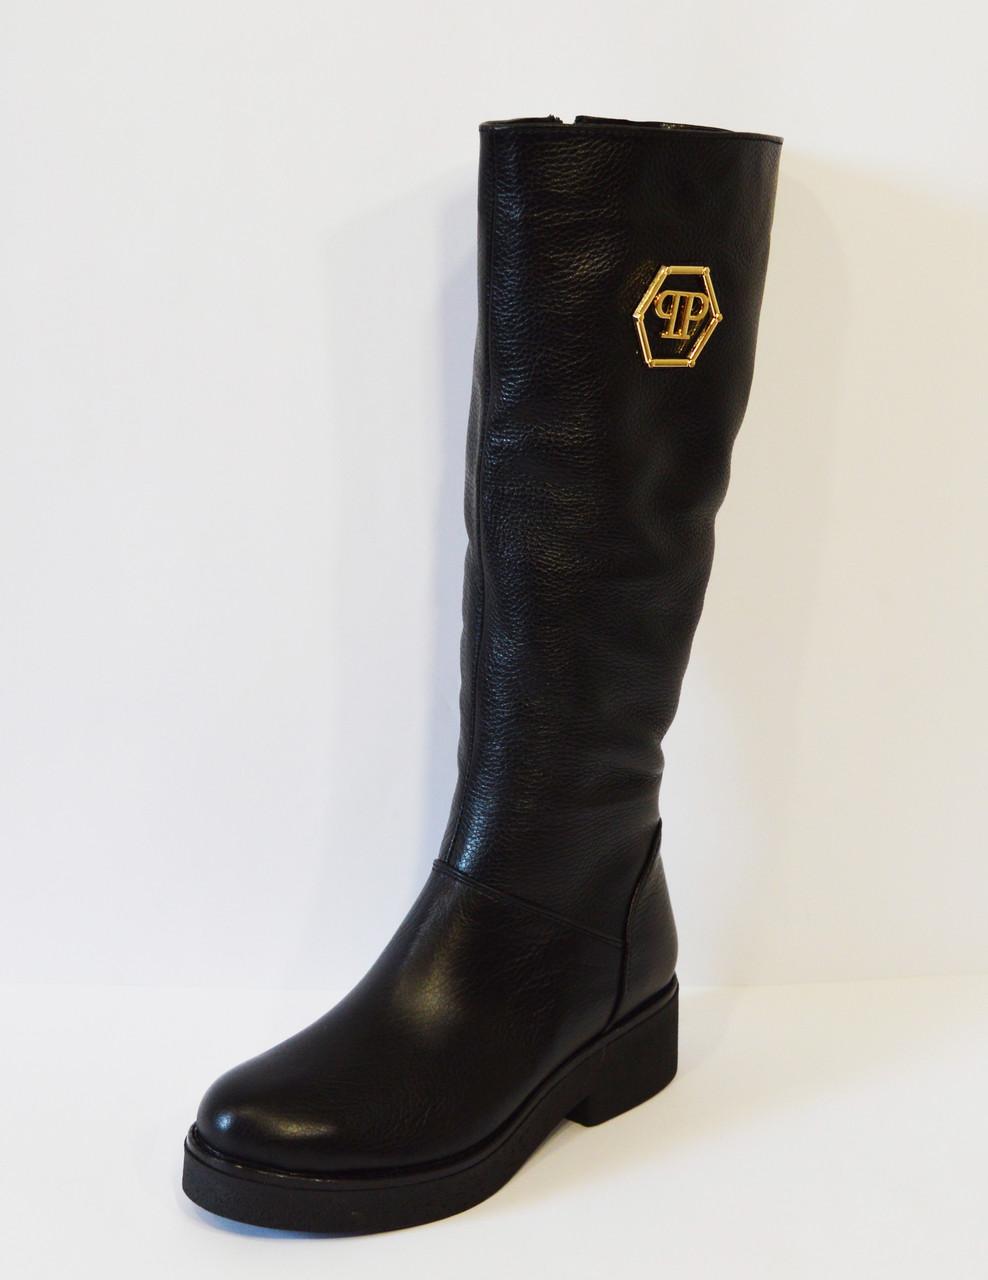 Кожаные женские сапоги Kento 007 - КРЕЩАТИК - интернет магазин обуви в  Александрии a0e80546ccc5e